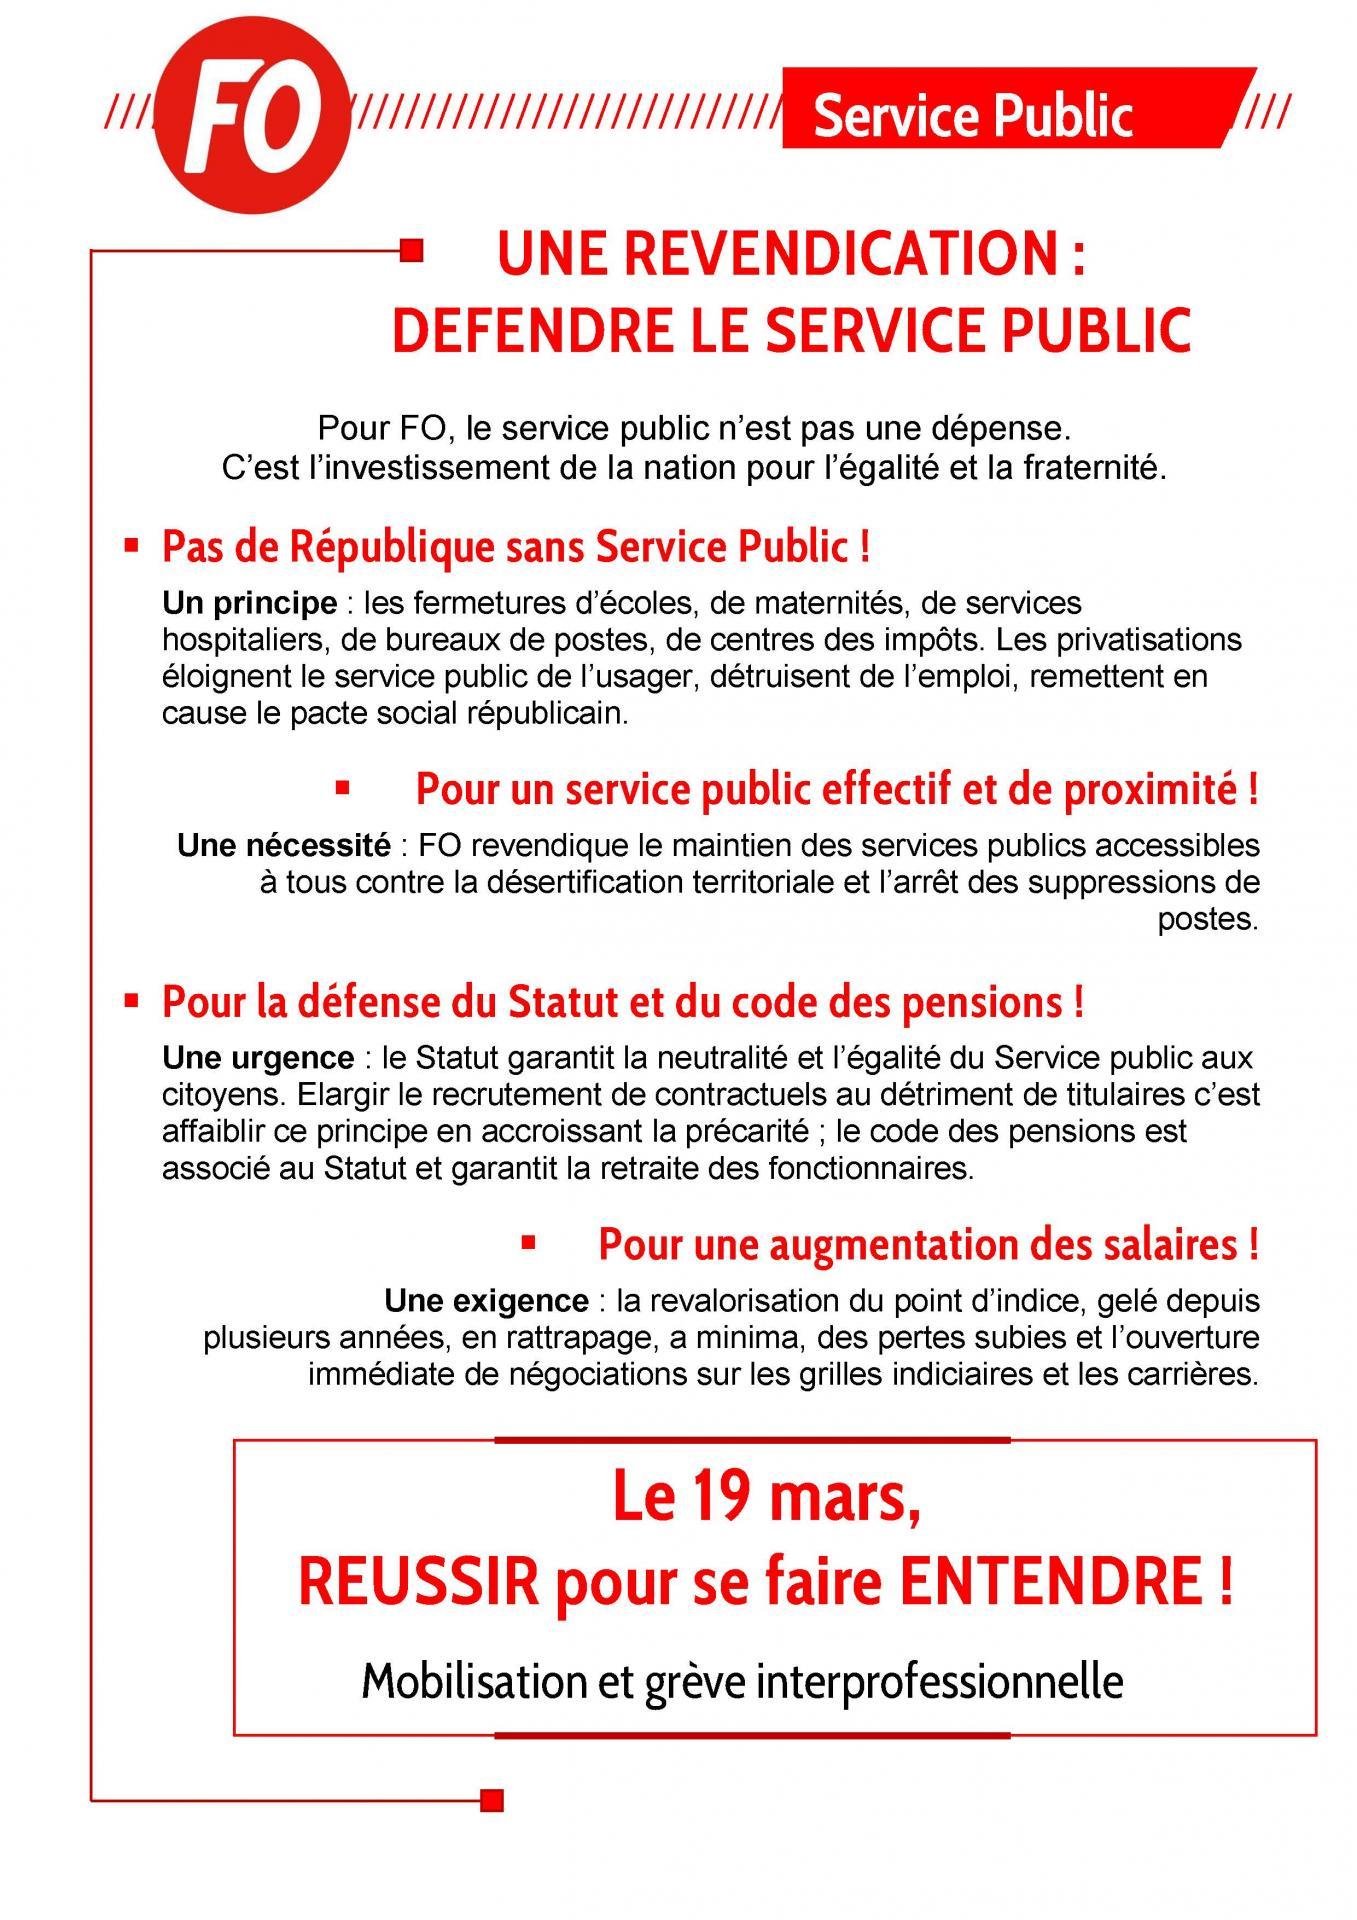 Tract service public 19 mars